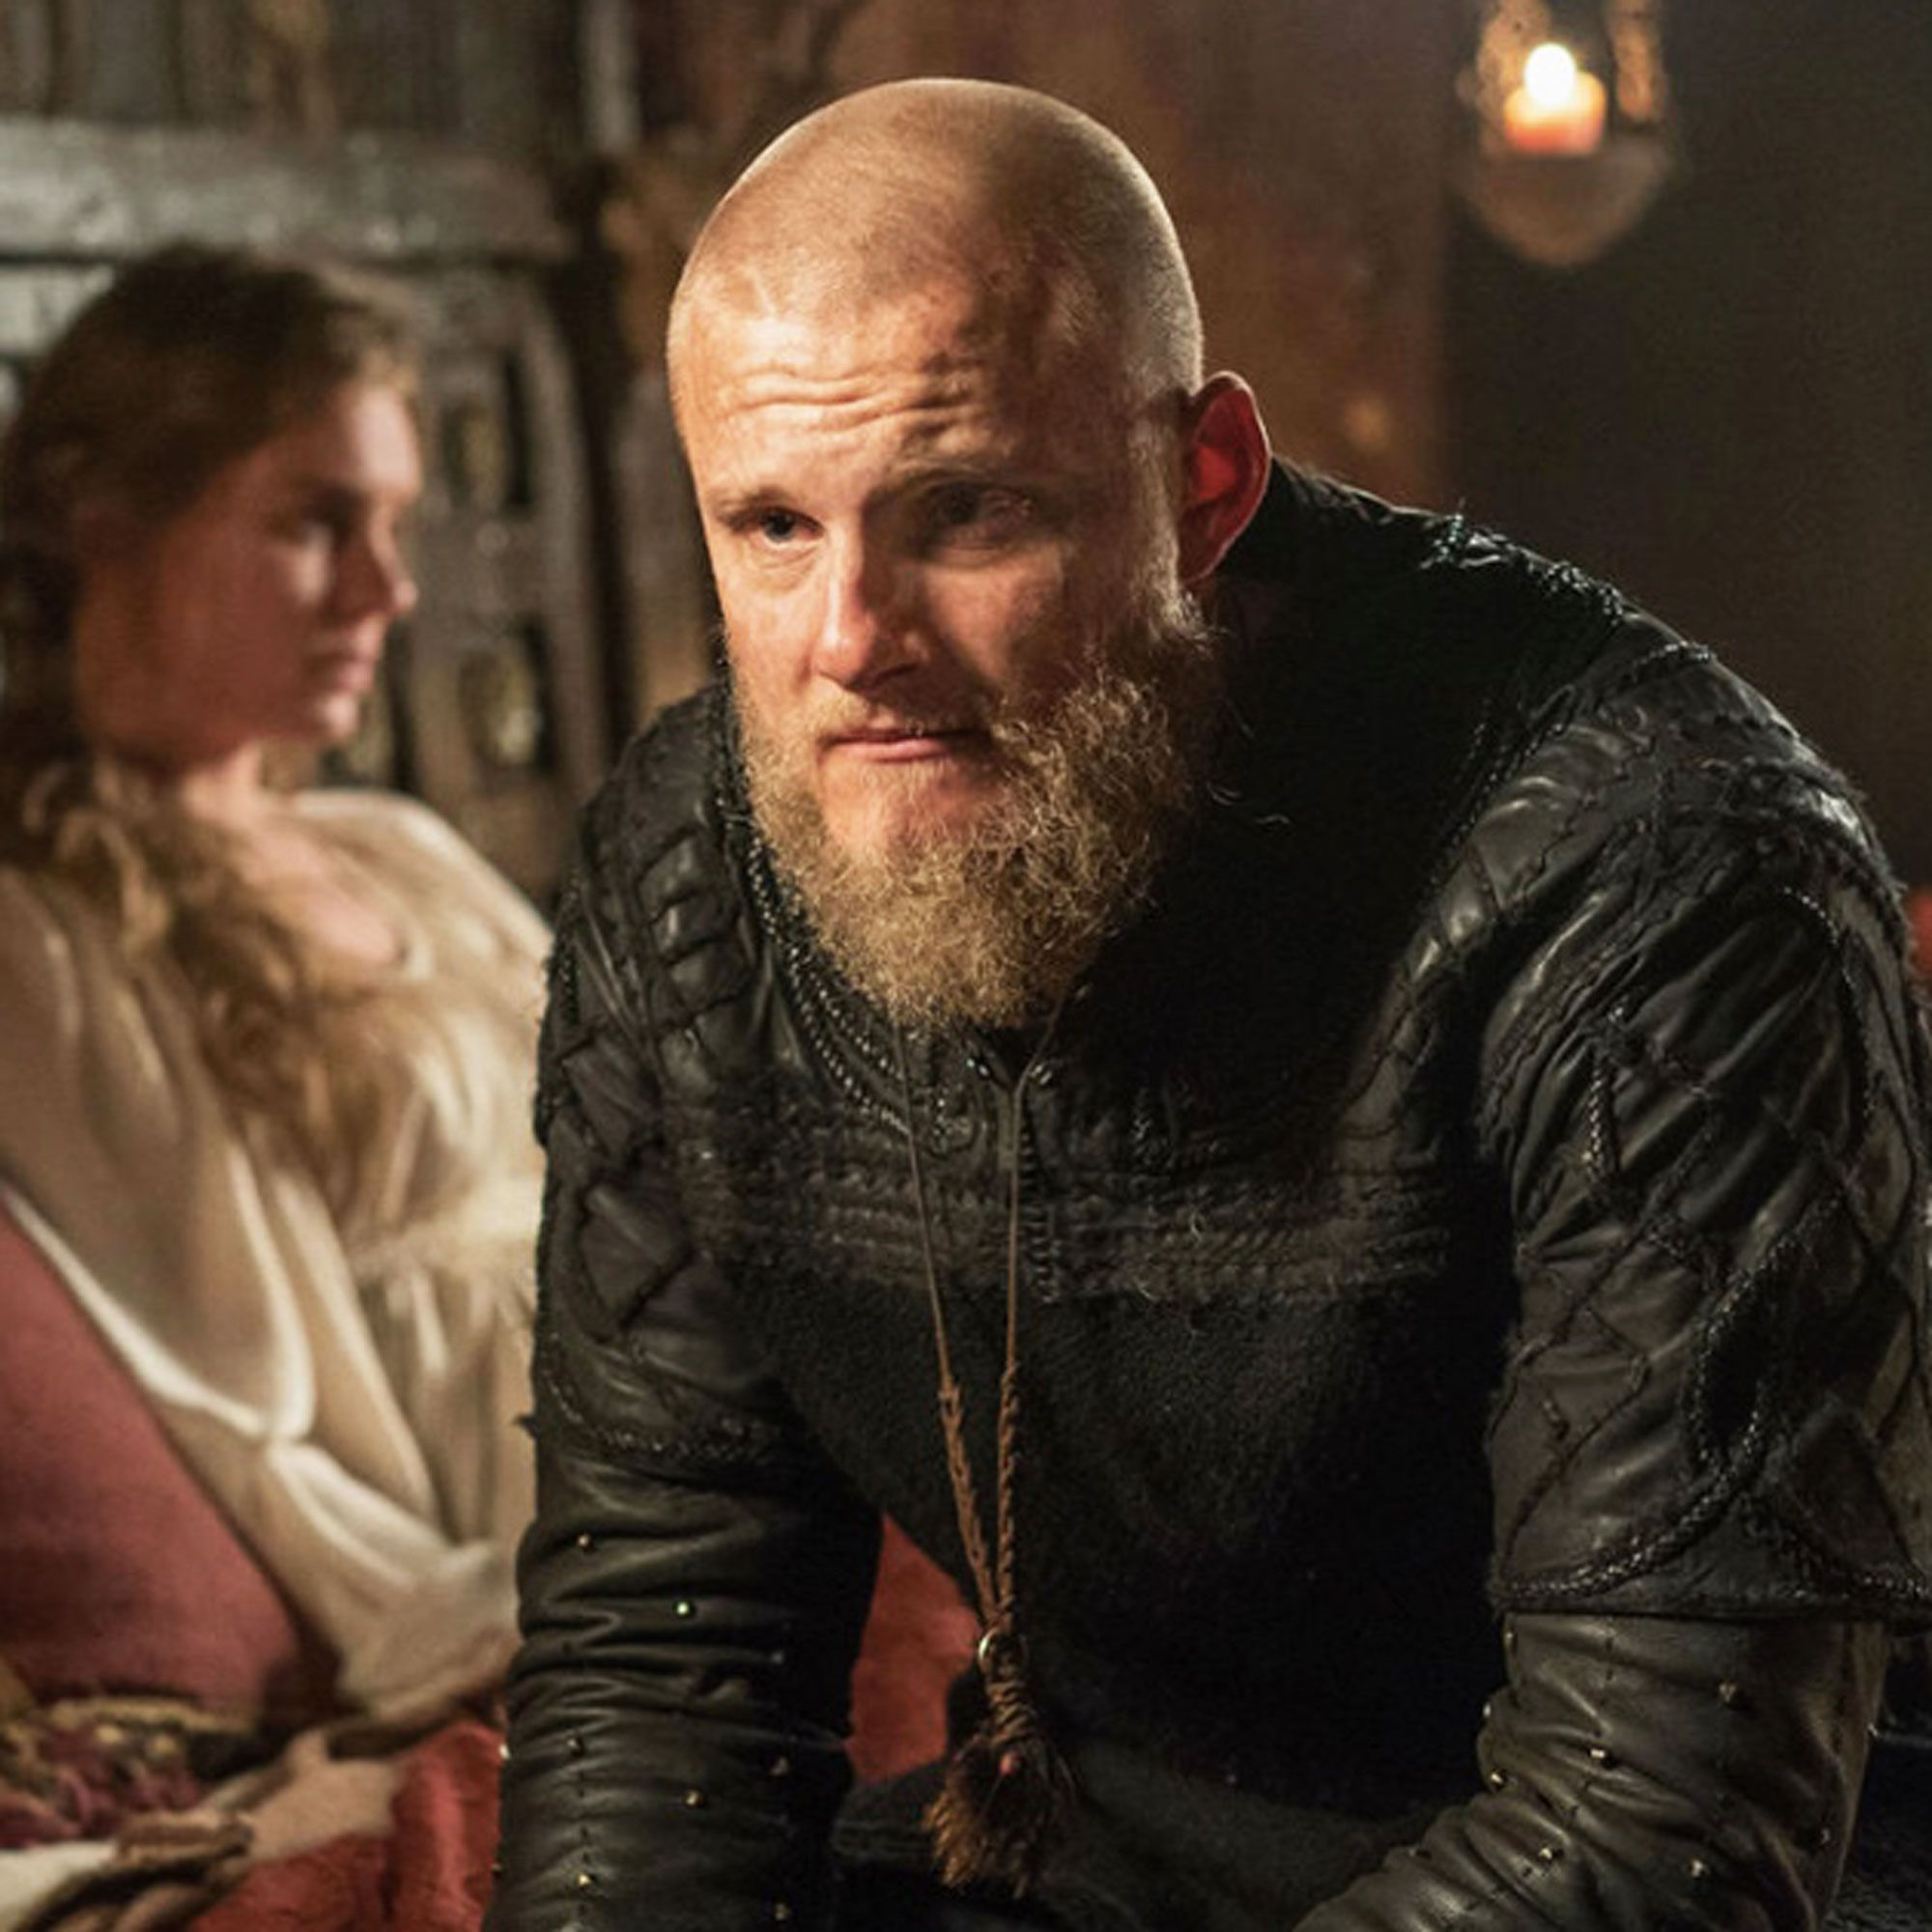 vikings 'vikings' the final season trailer   premieres january 1 9ep 2:20 dec 11, 2020 vikings the sons of ragnar: Vikings Season 7 Is It Happening